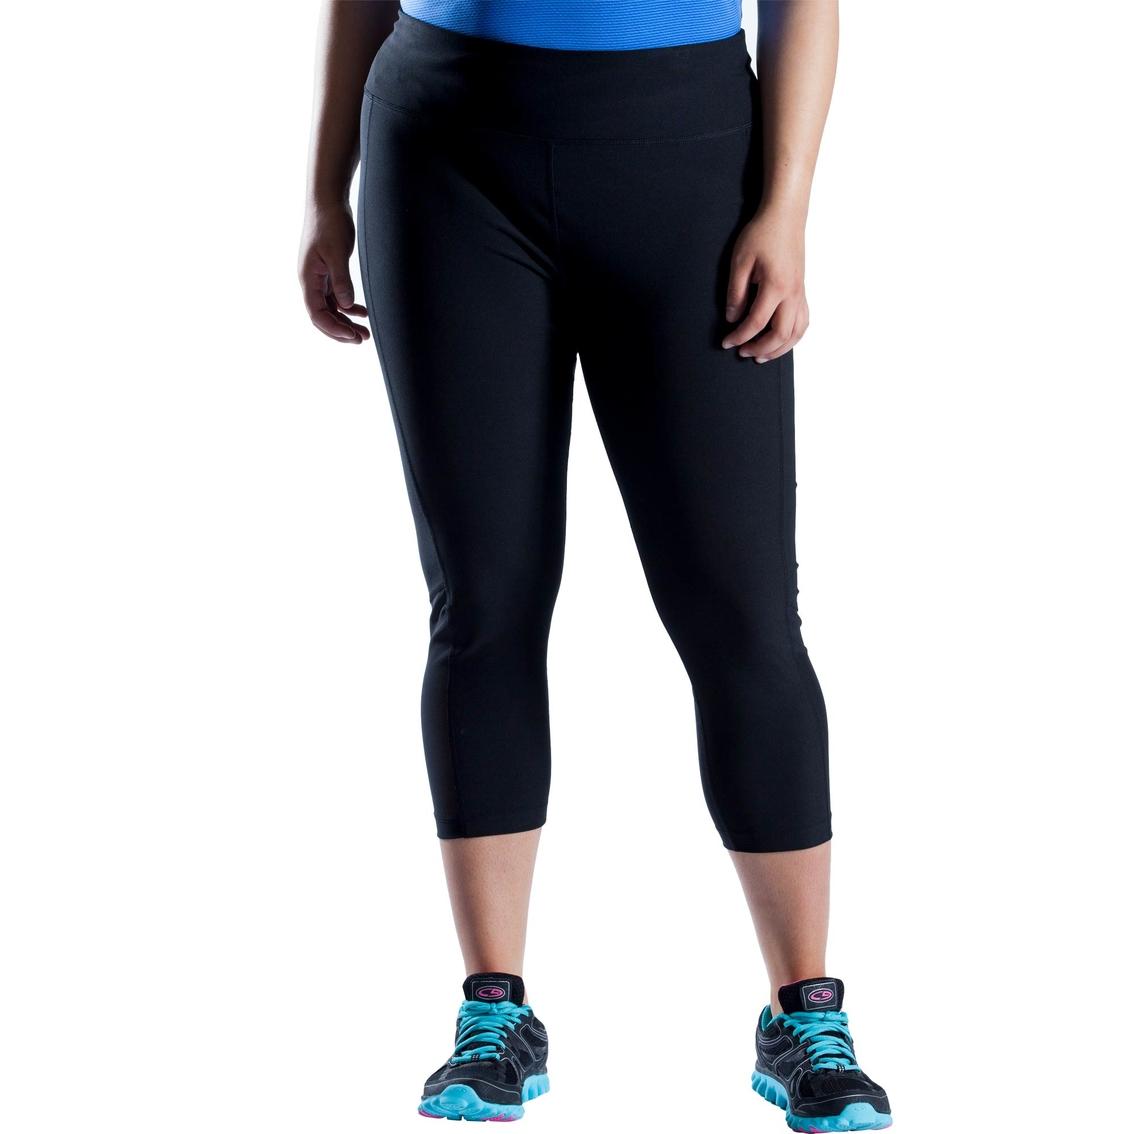 a159e3a84e4c0 Pbx Pro Plus Size Performance Jersey Mesh Cropped Pants